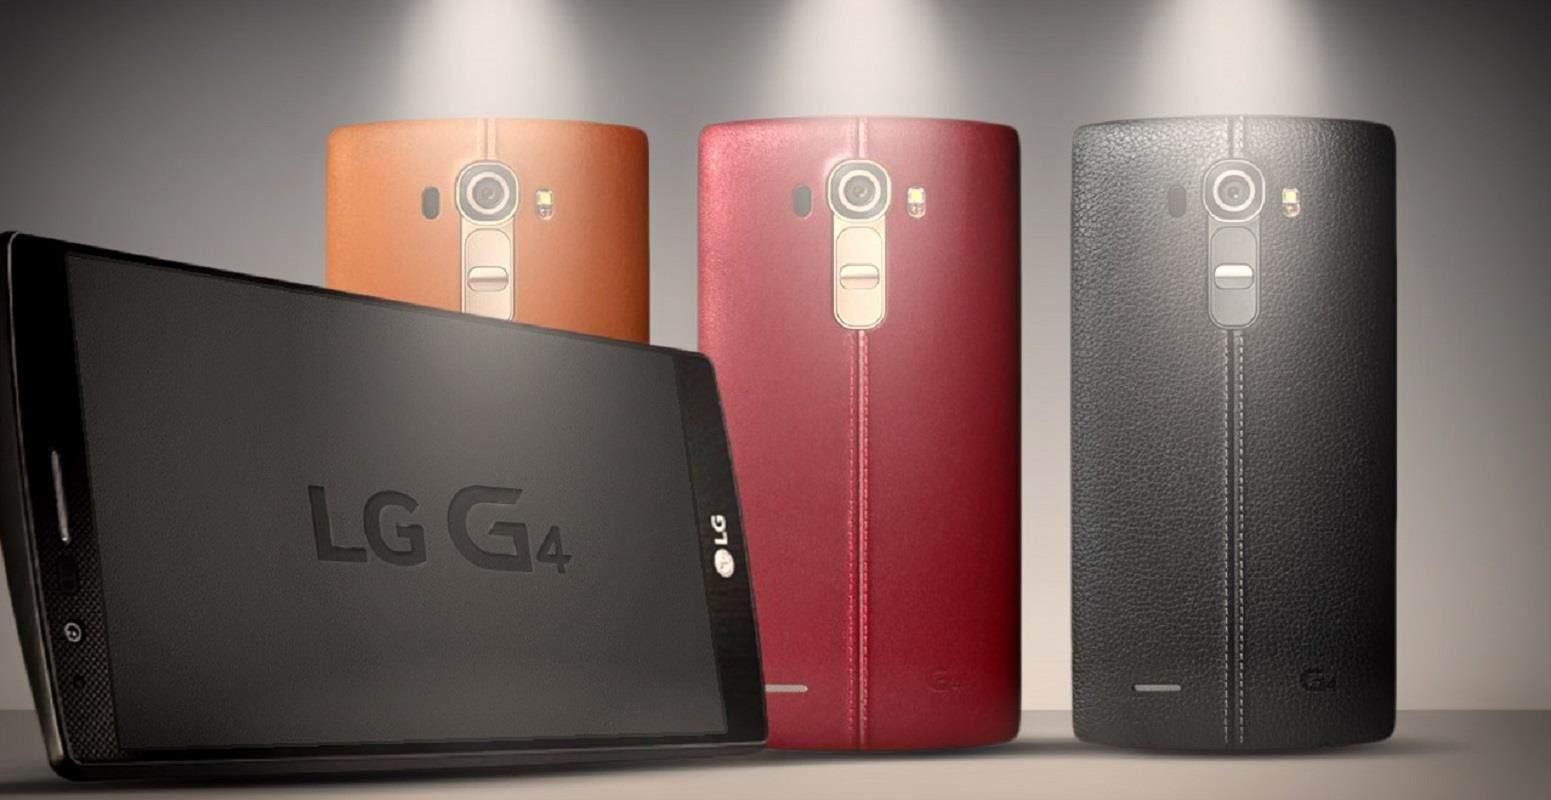 LG G4 Andorid 6.0 Marshmallow'a Güncelleme Nasıl Yapılır? 2